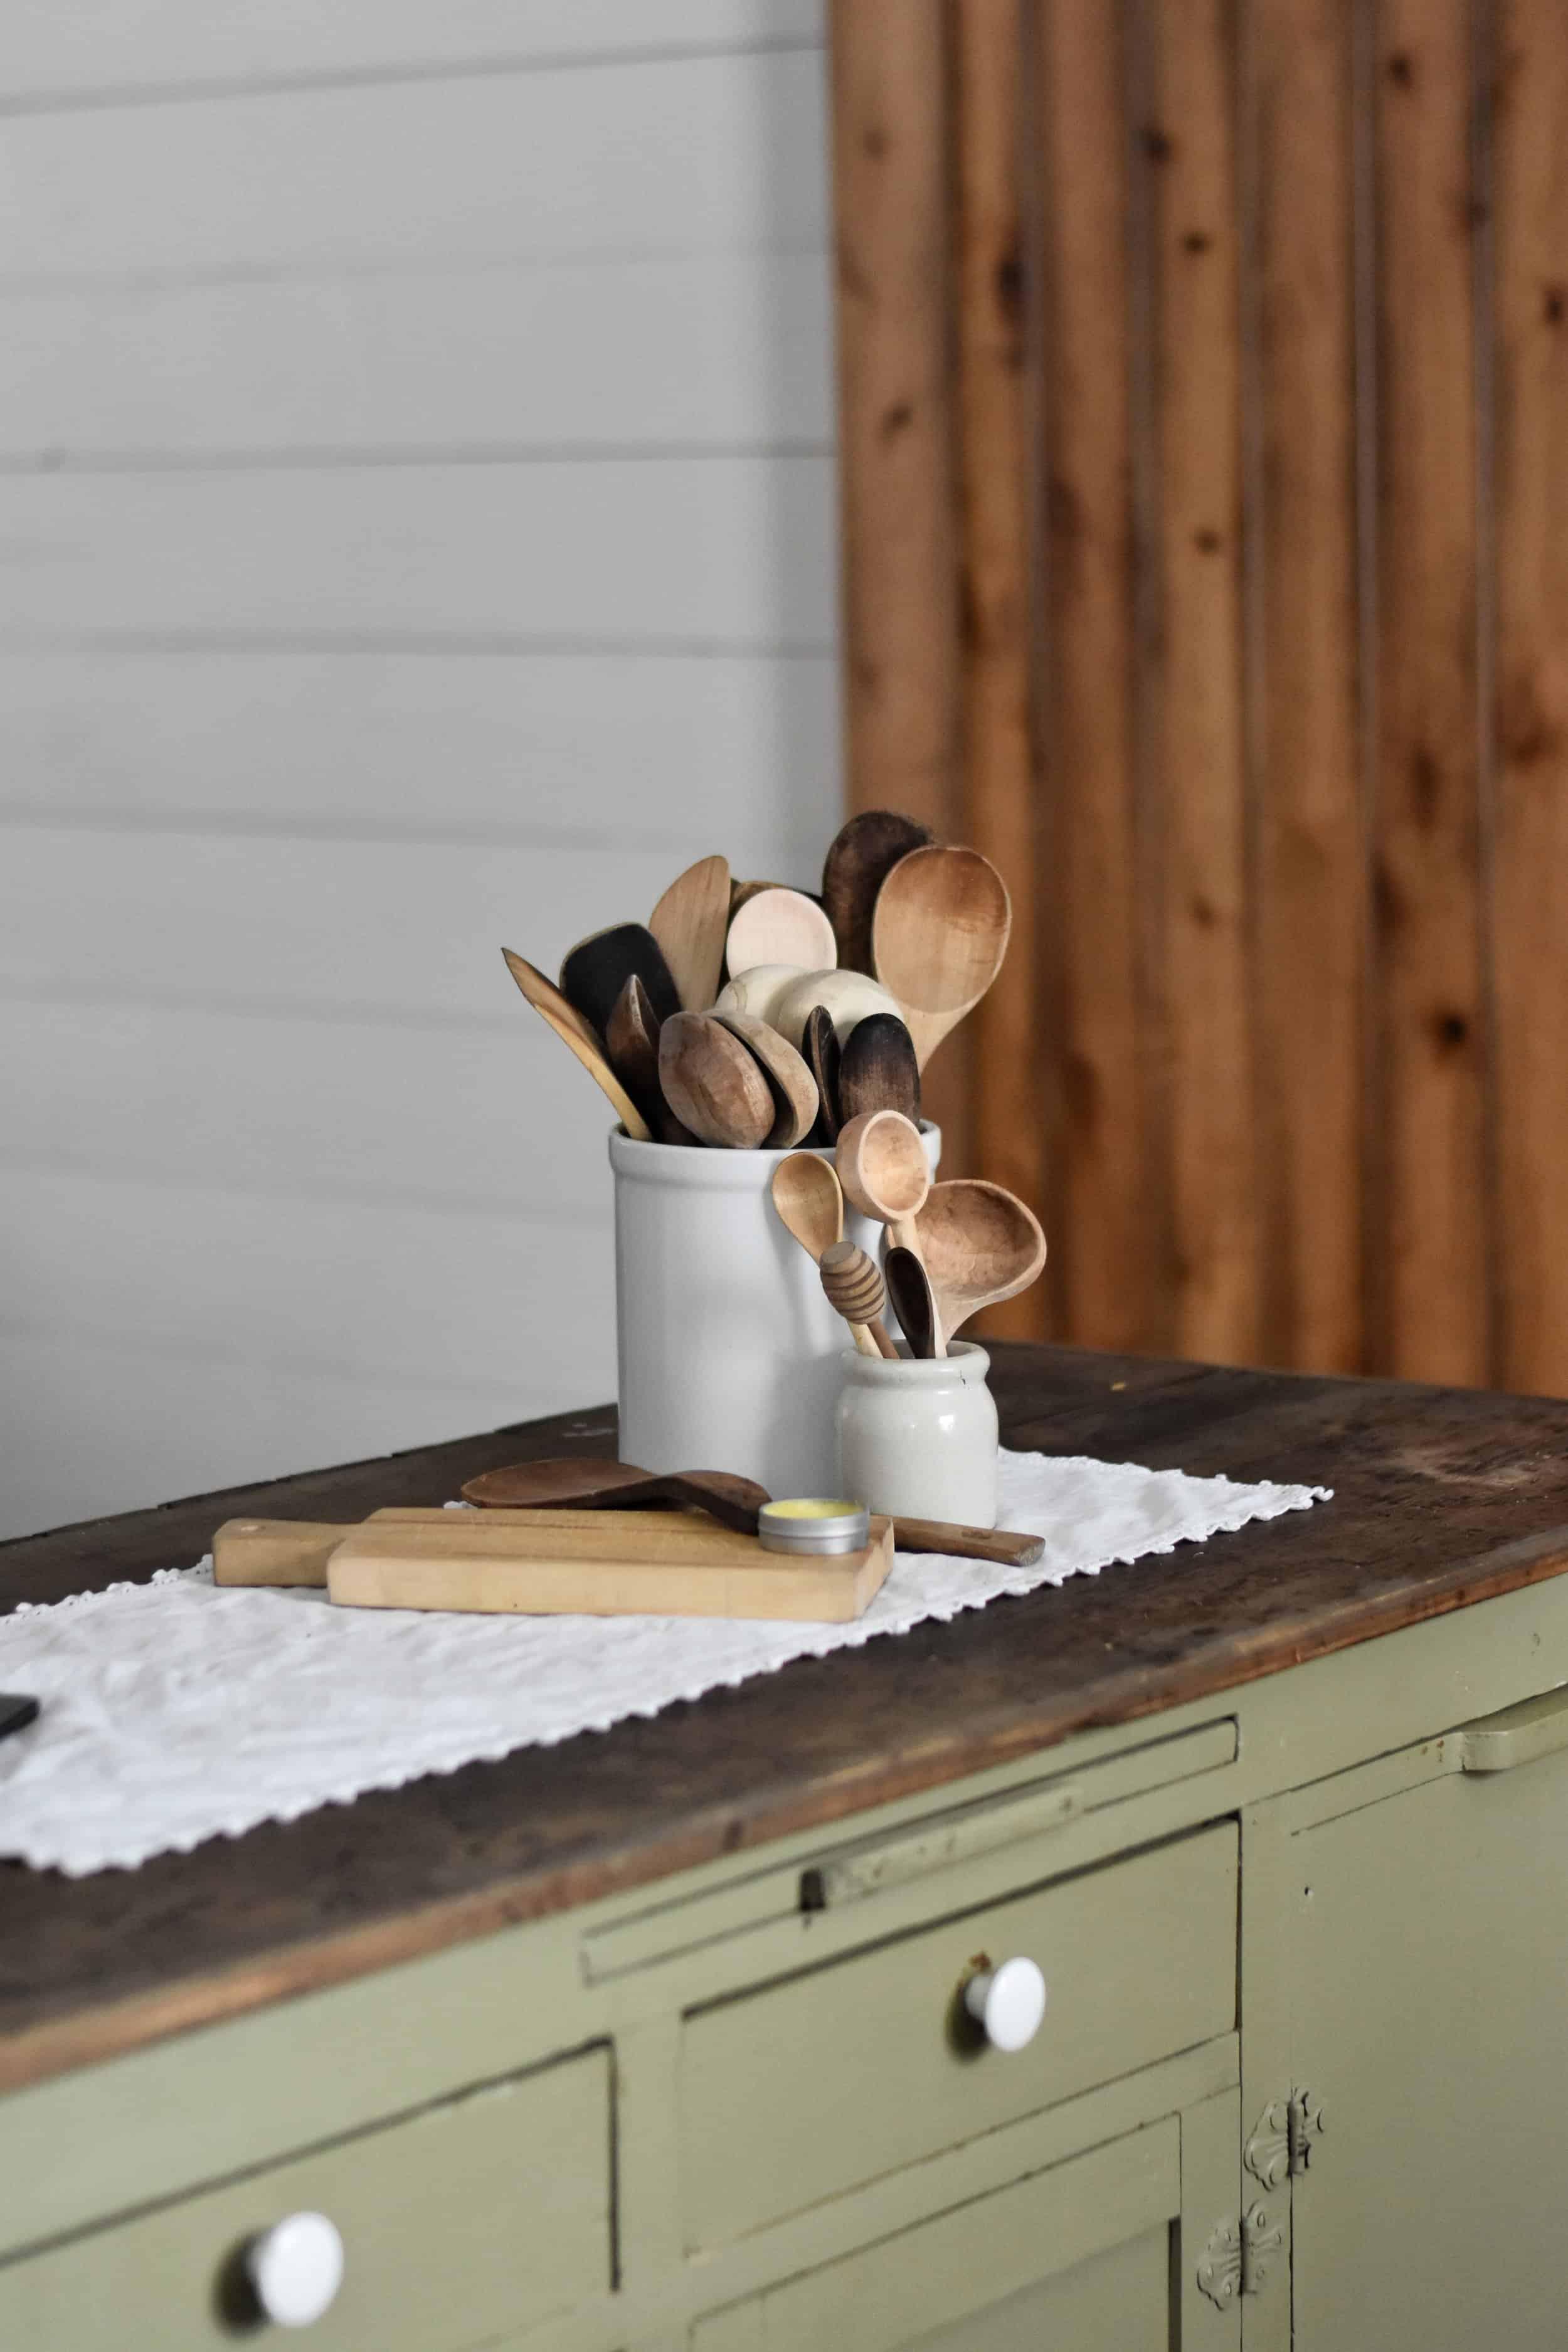 Caring for Wooden Utensils